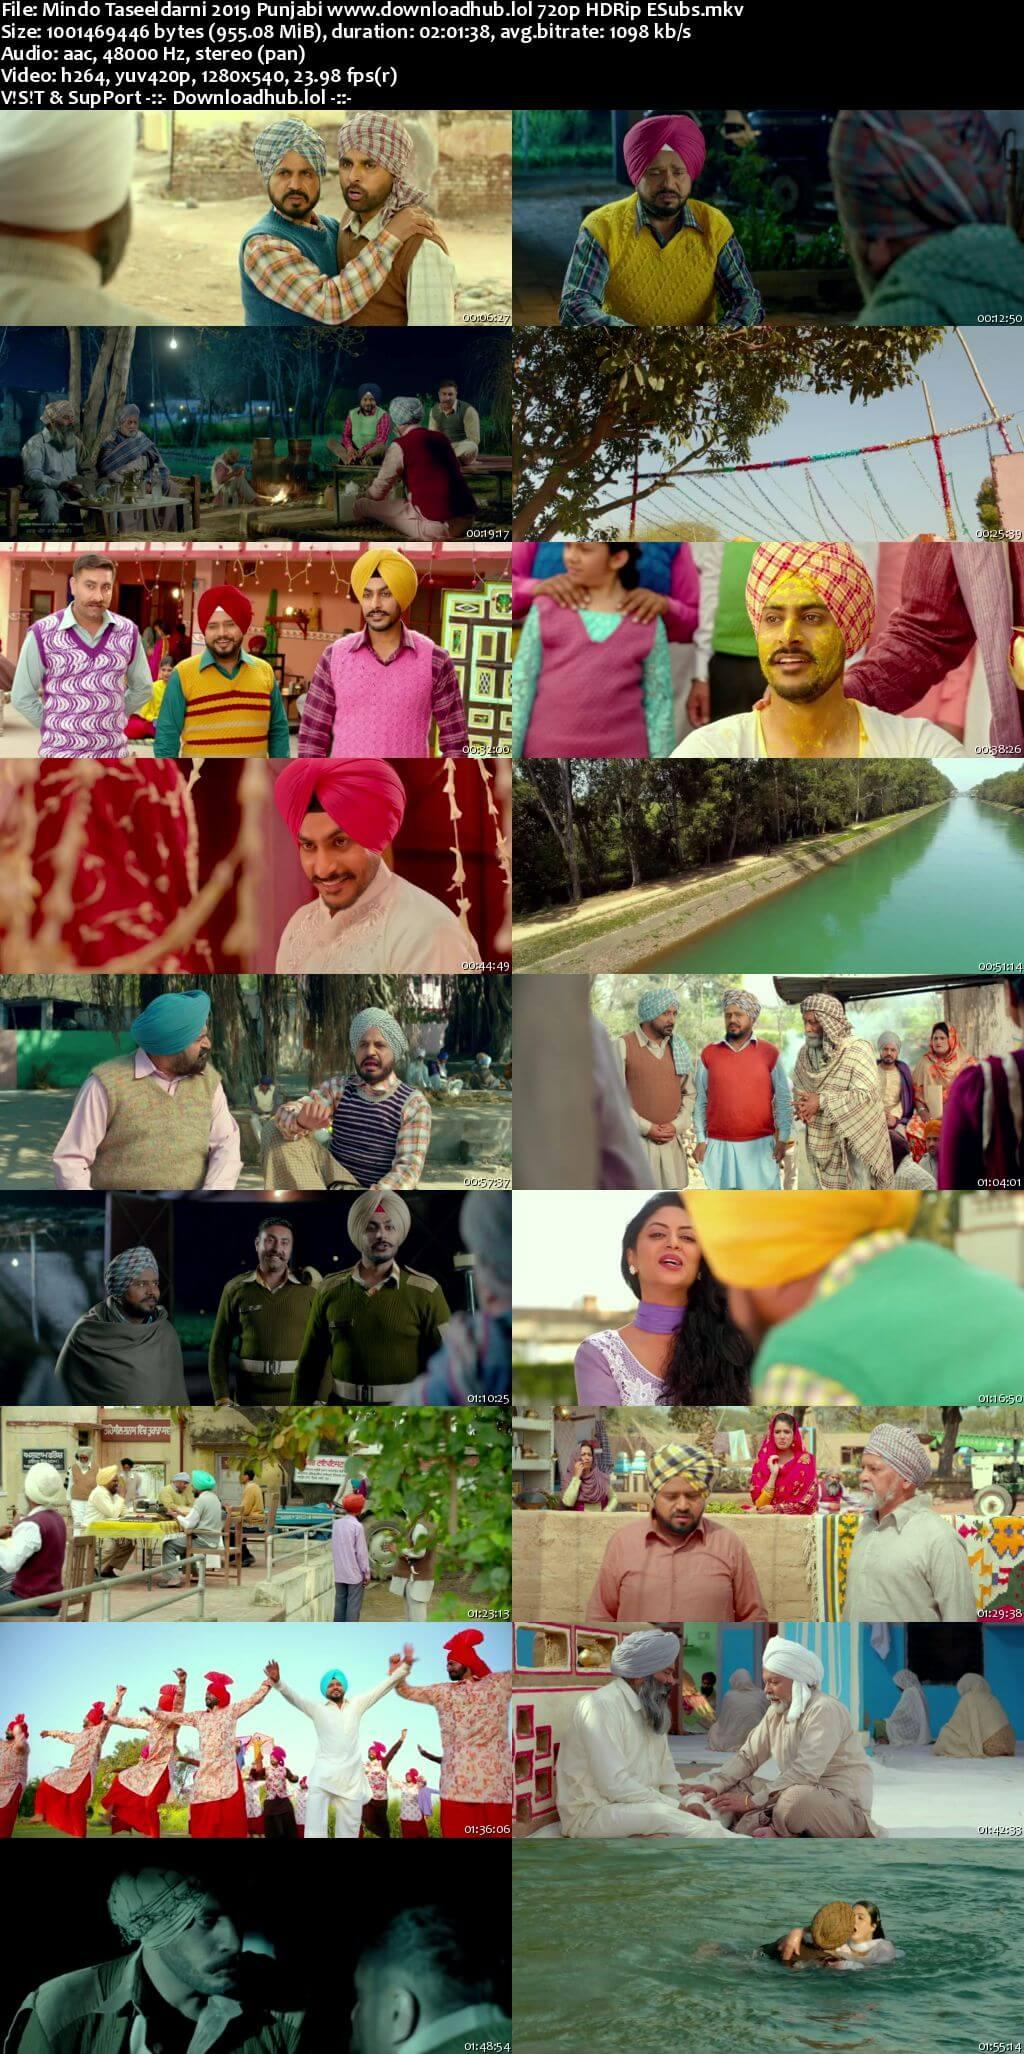 Mindo Taseeldarni 2019 Punjabi 720p HDRip ESubs